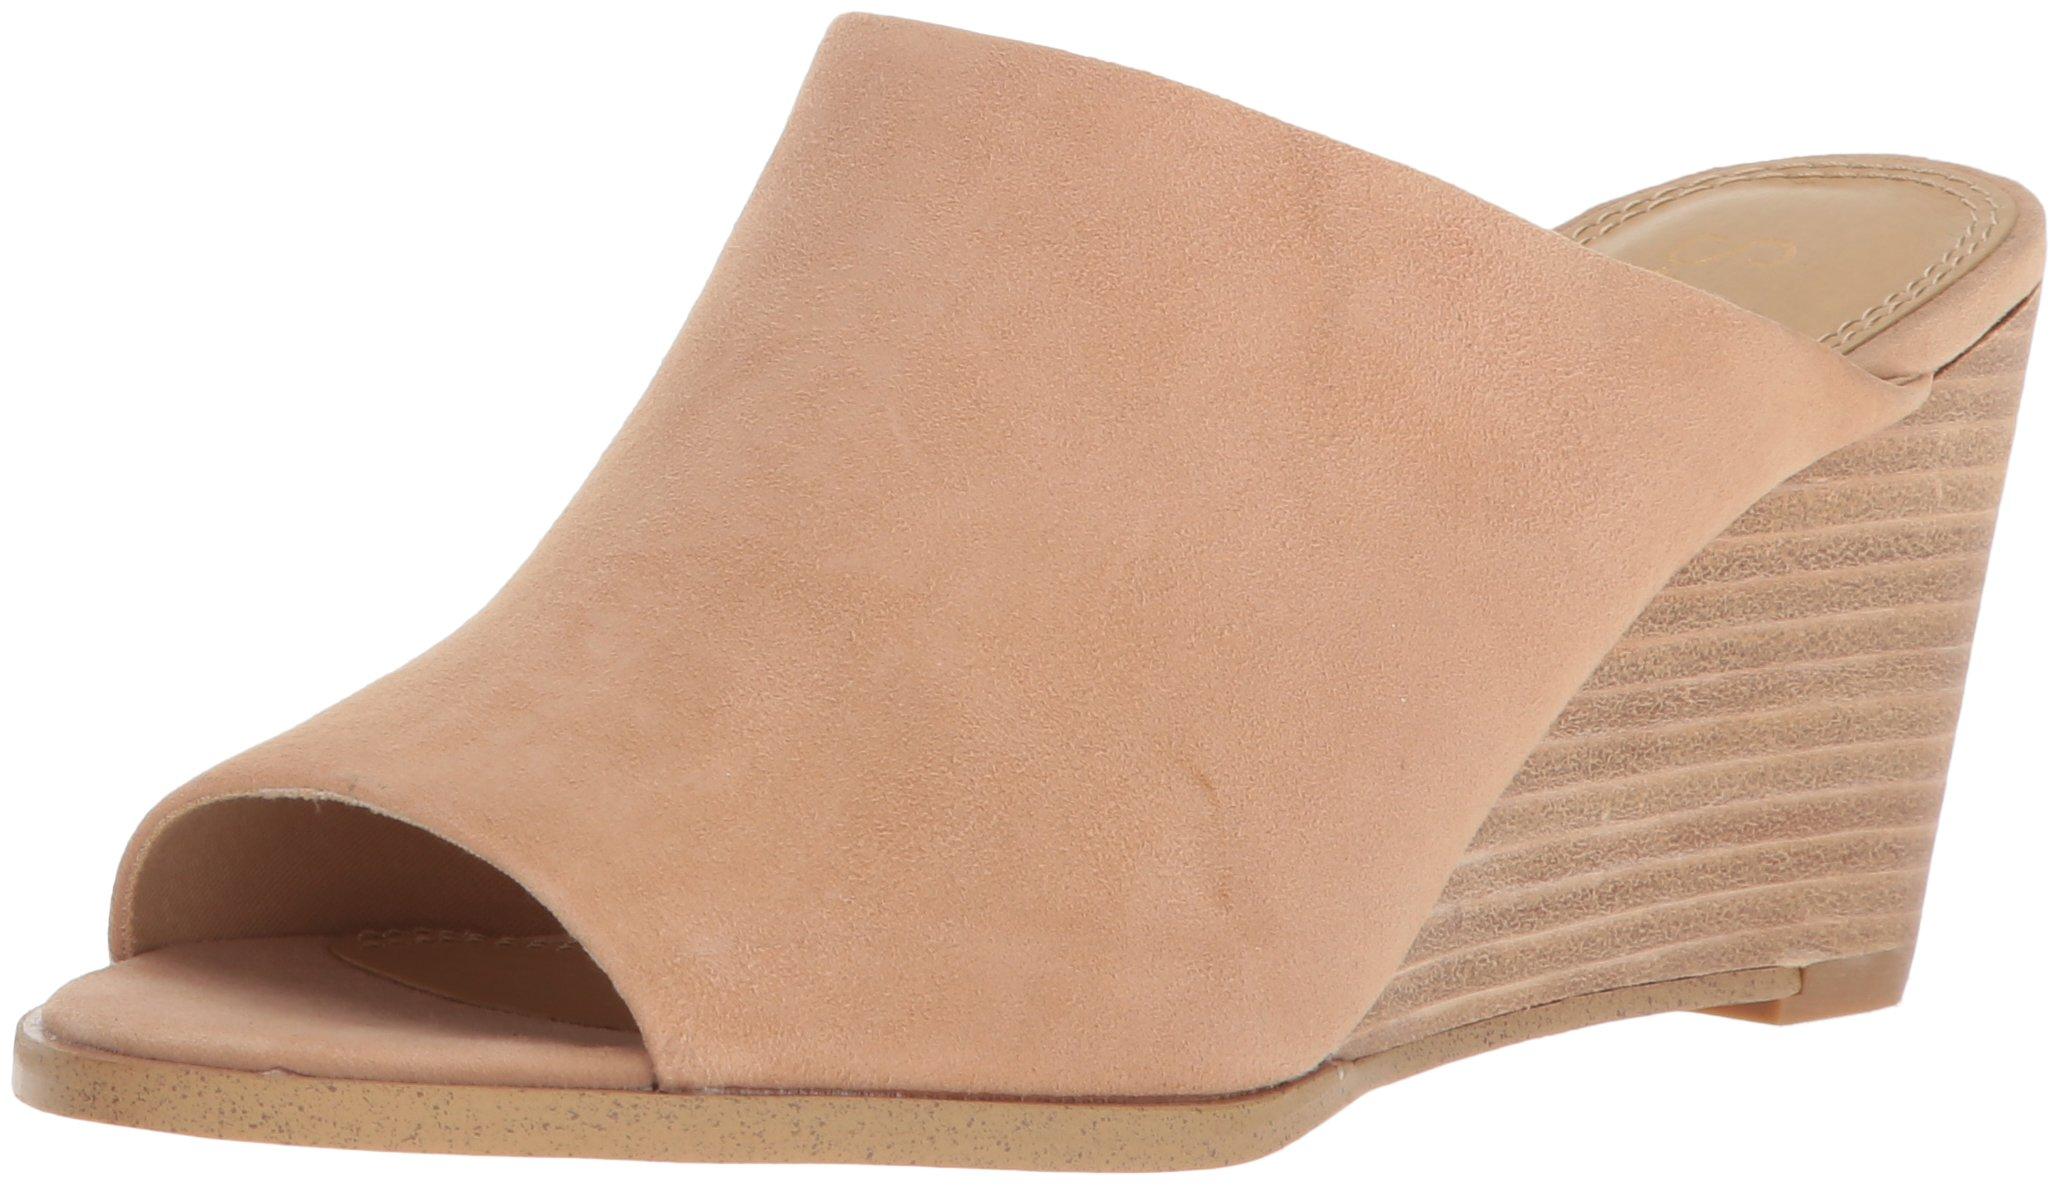 Splendid Women's Fenwick Wedge Sandal, Nude, 6.5 Medium US